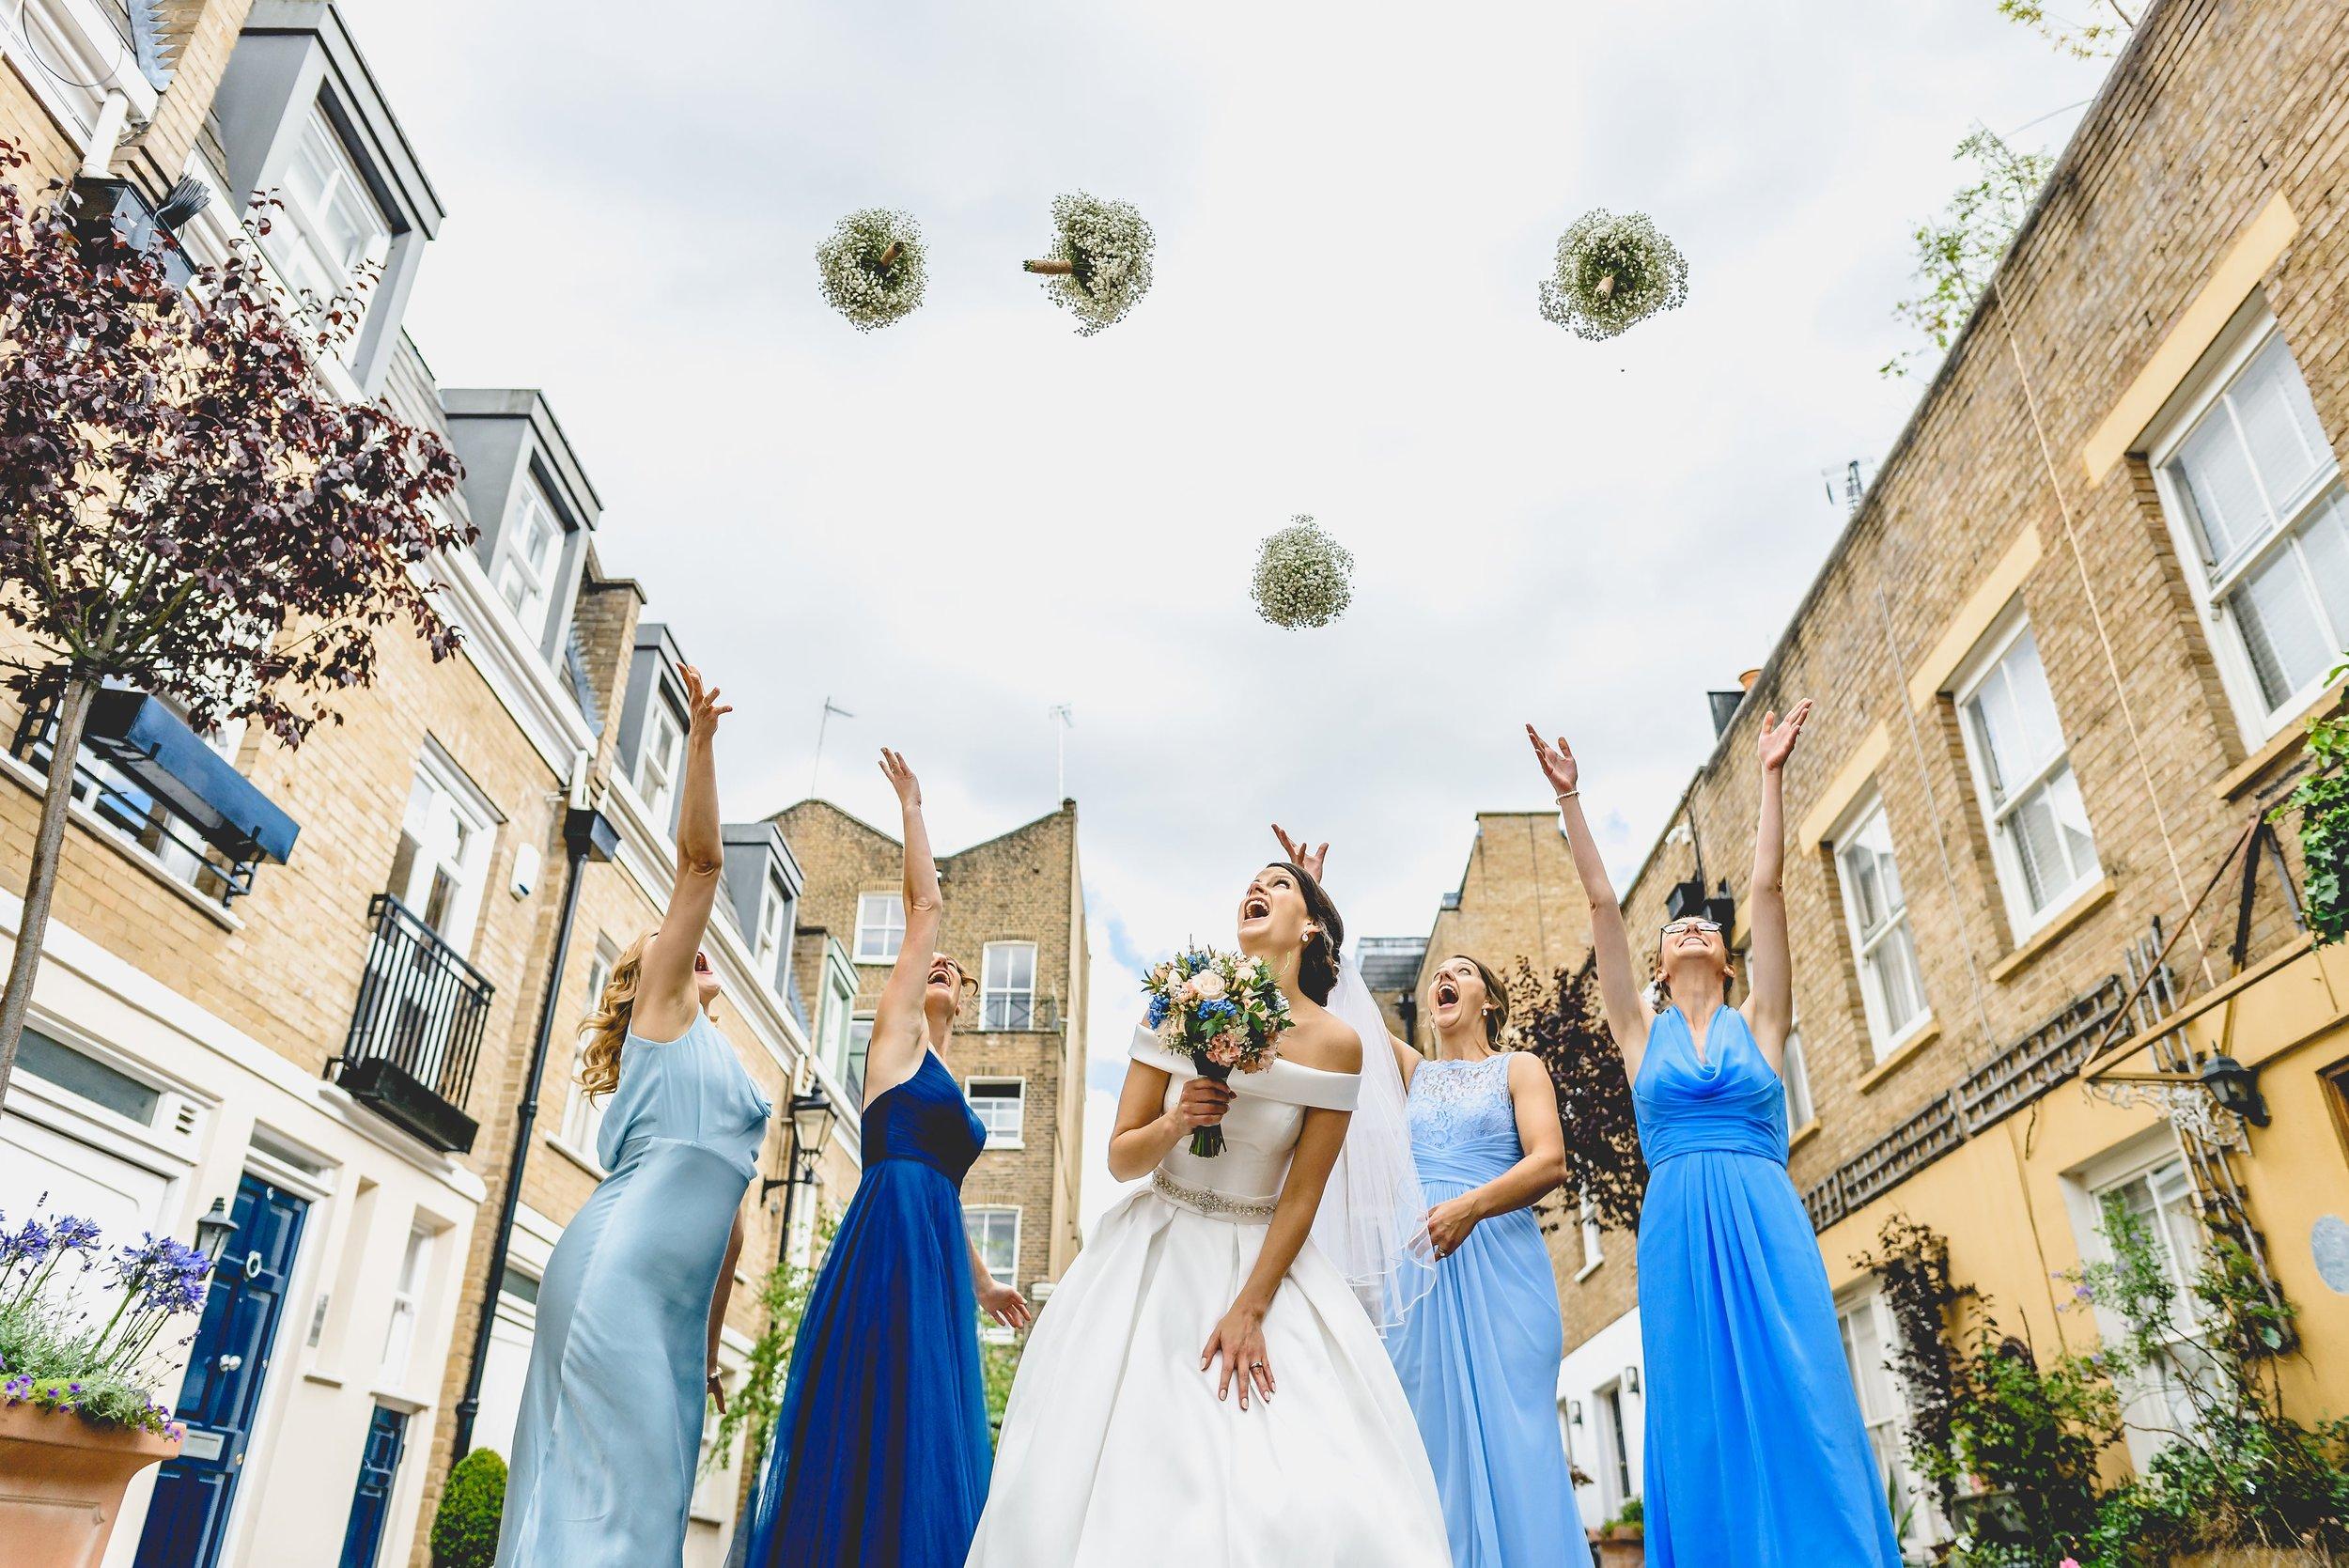 North London Wedding makeup artist and wedding hair stylist